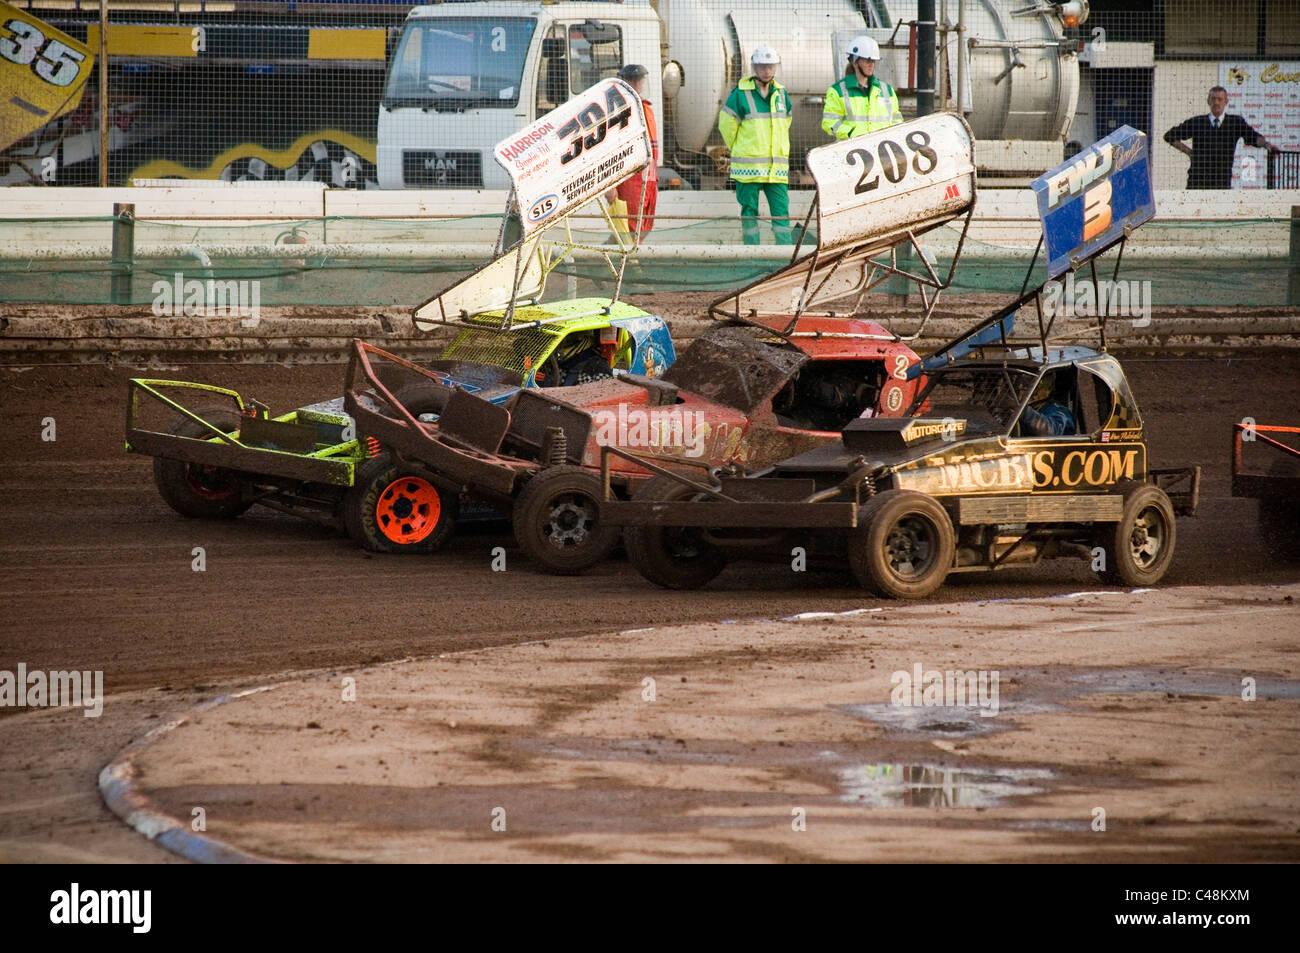 formula 0ne 1 f1 stock car cars stockcars stockcar shale track tracks race racing racers full contact motorsport - Stock Image